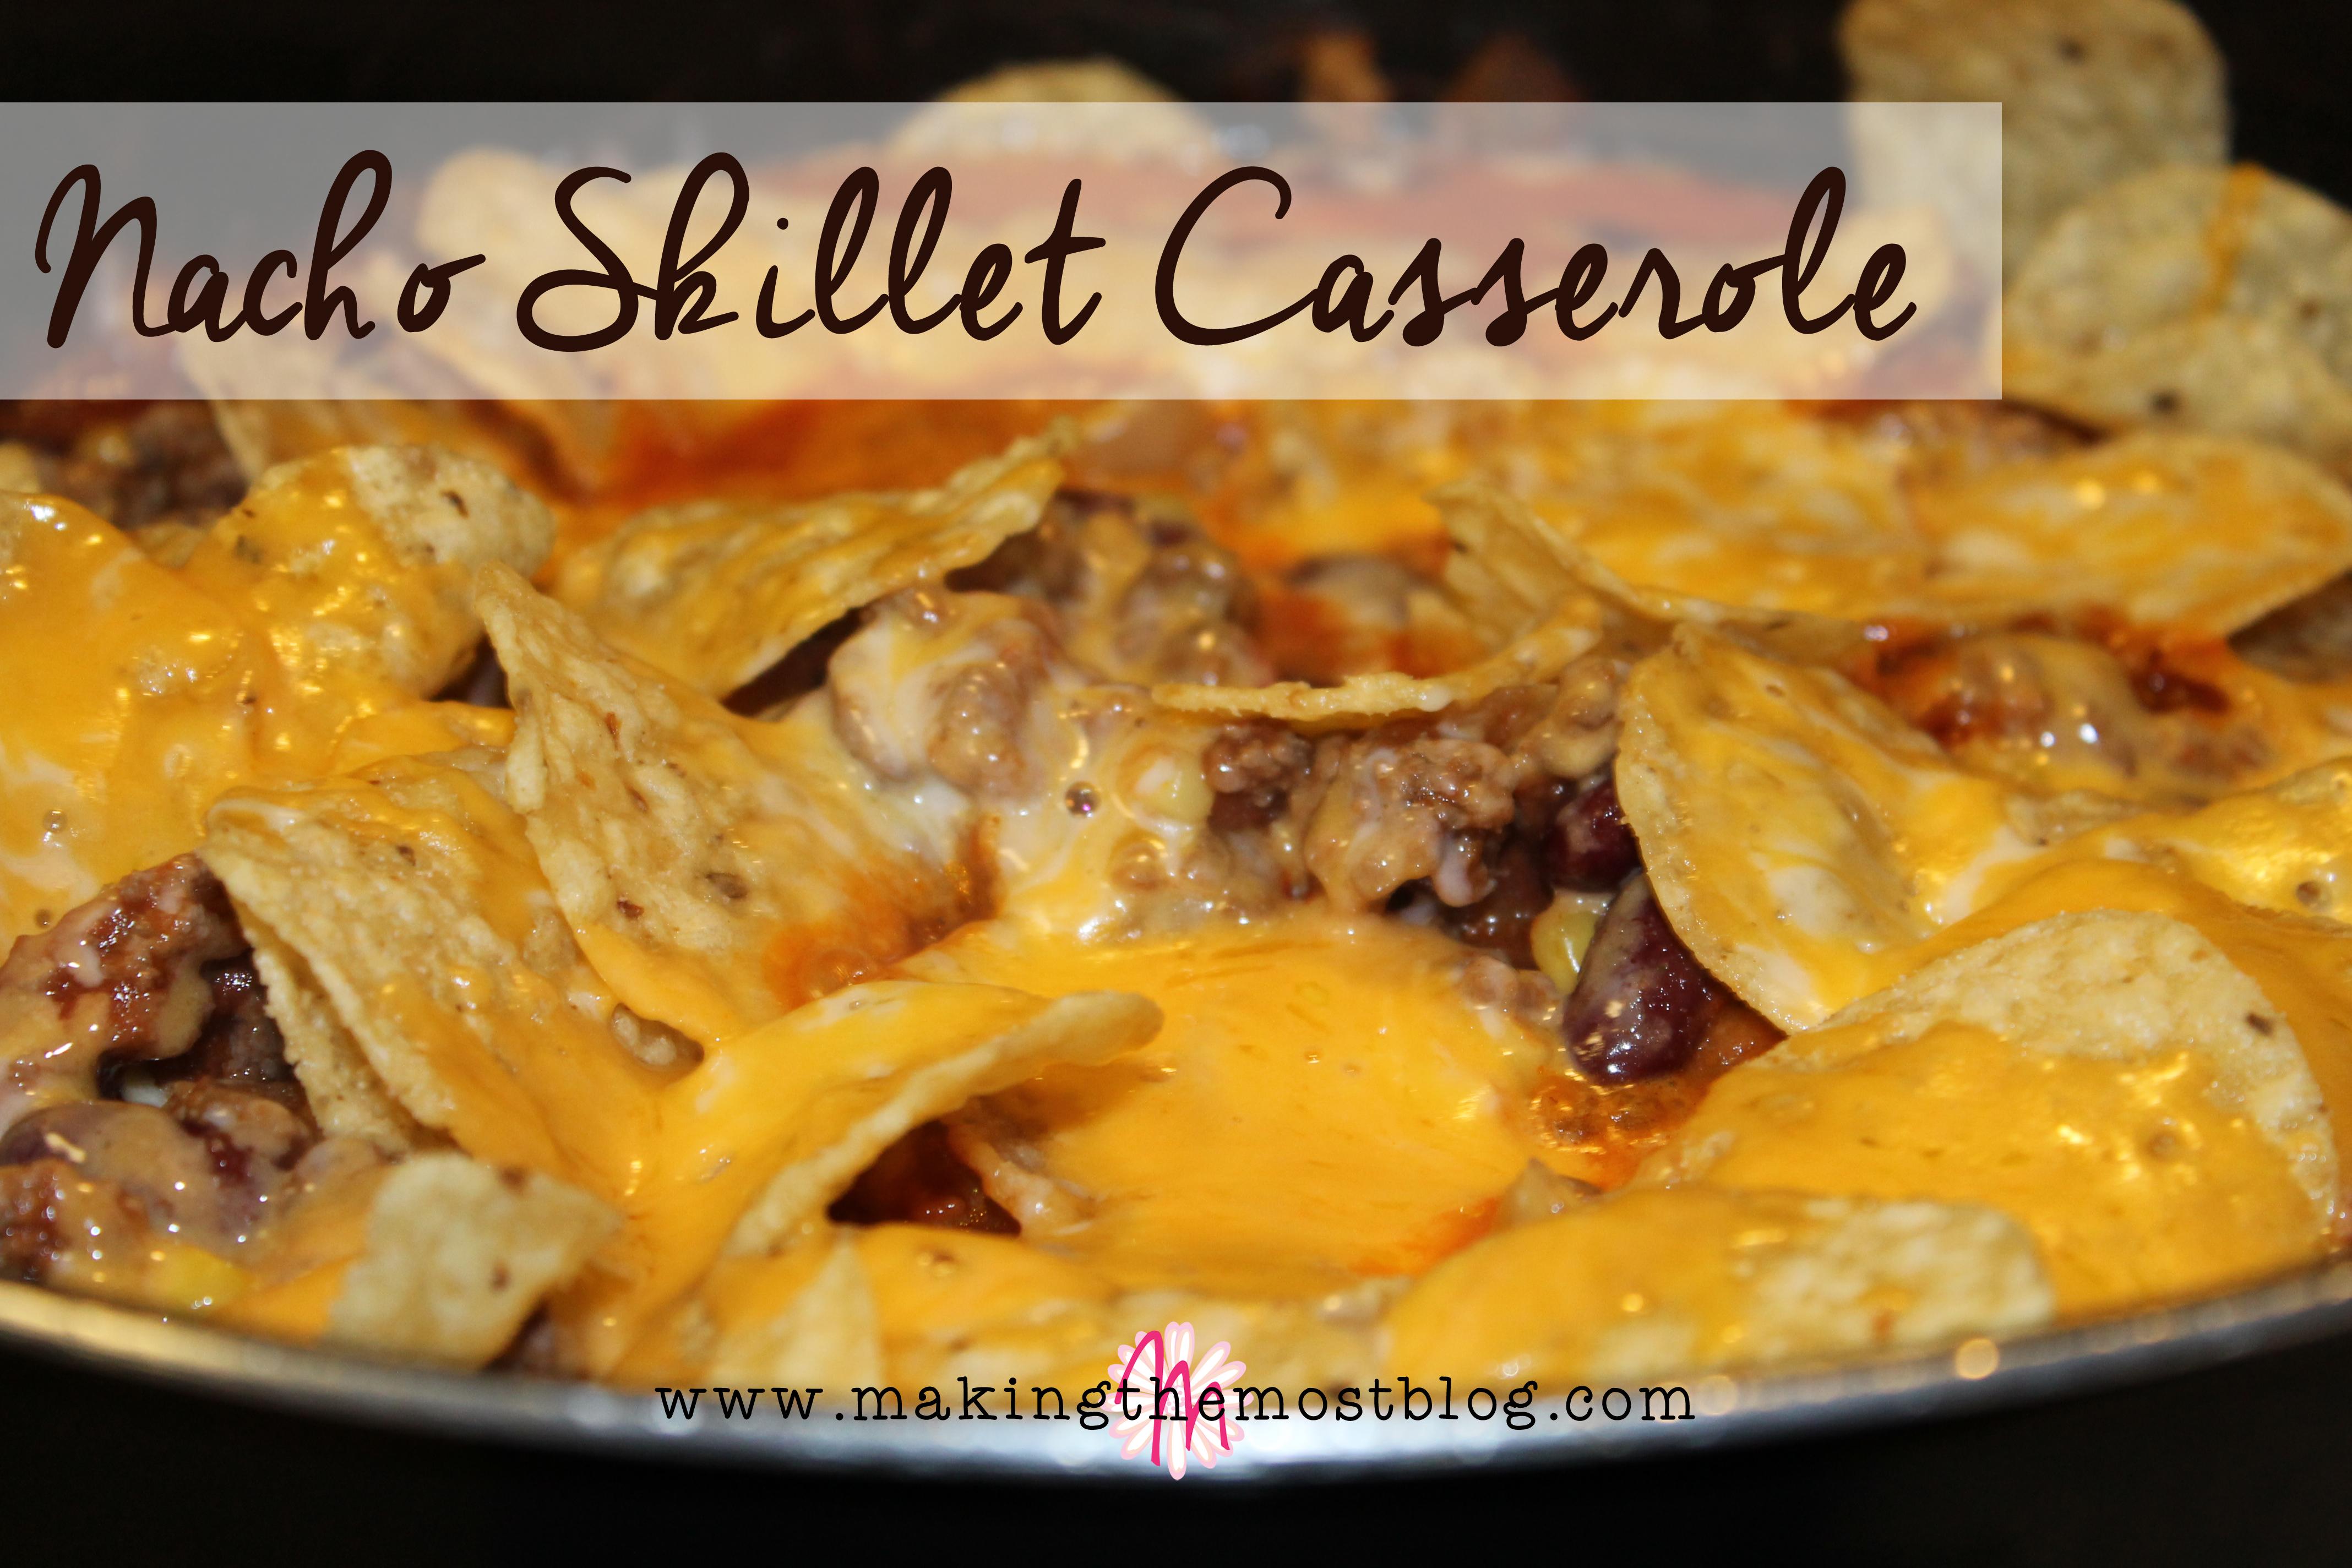 Nacho Skillet Casserole | Making the Most Blog